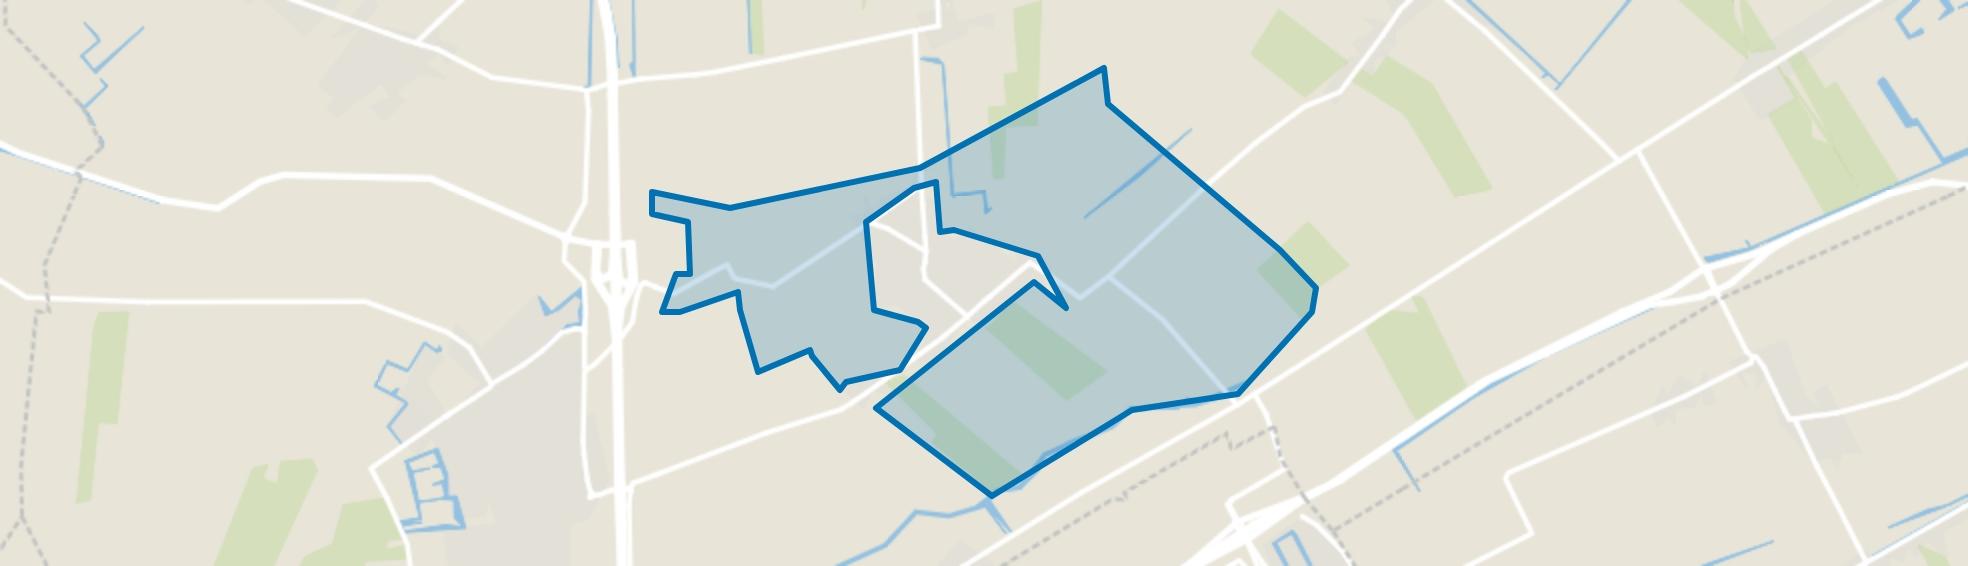 Nibbixwoud Buitengebied, Nibbixwoud map